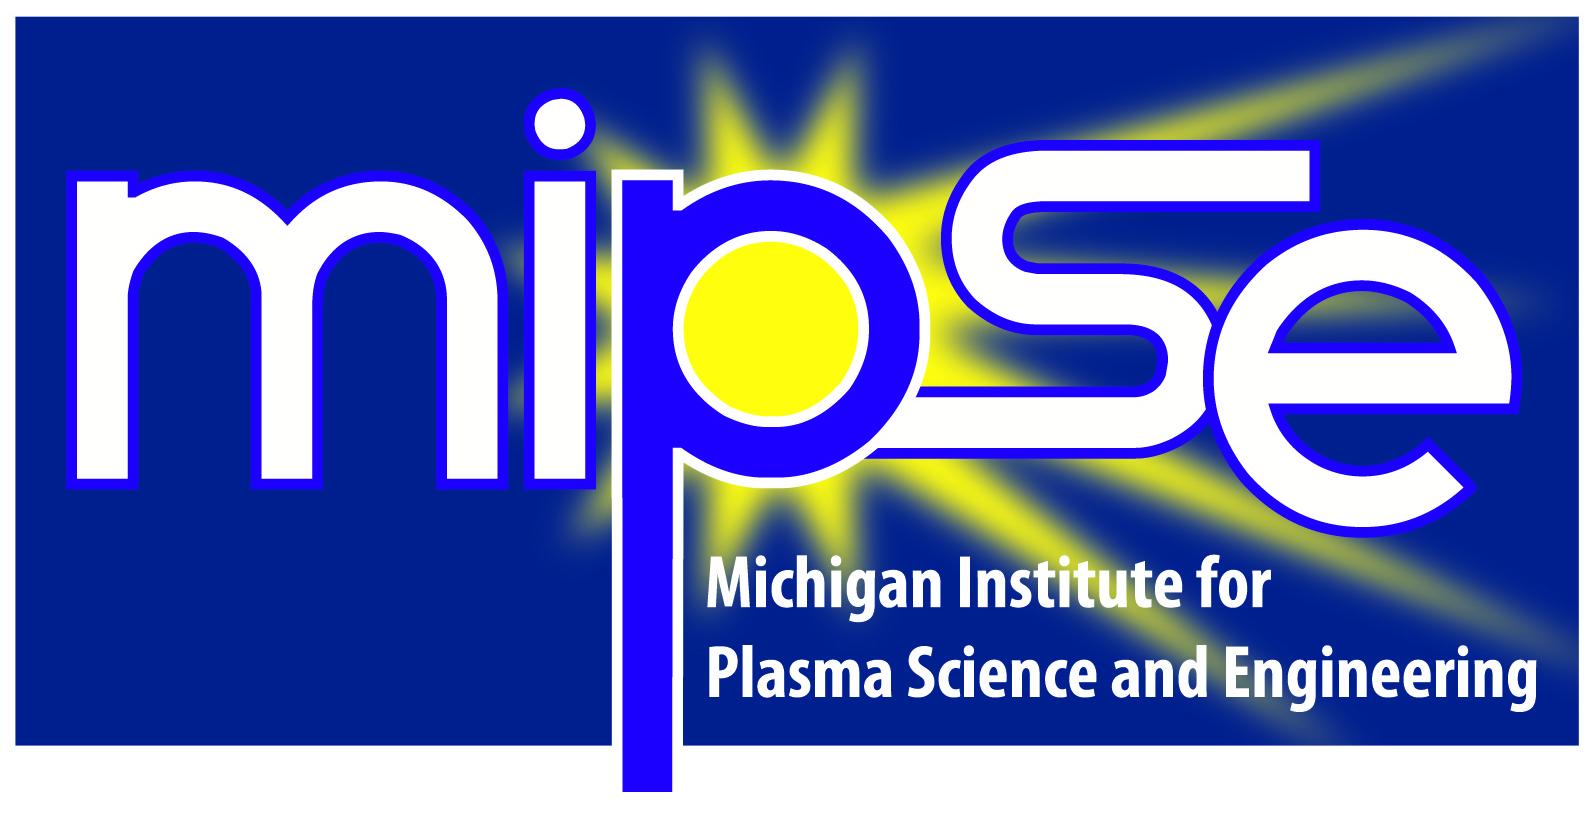 MIPSE logo in JPEG format